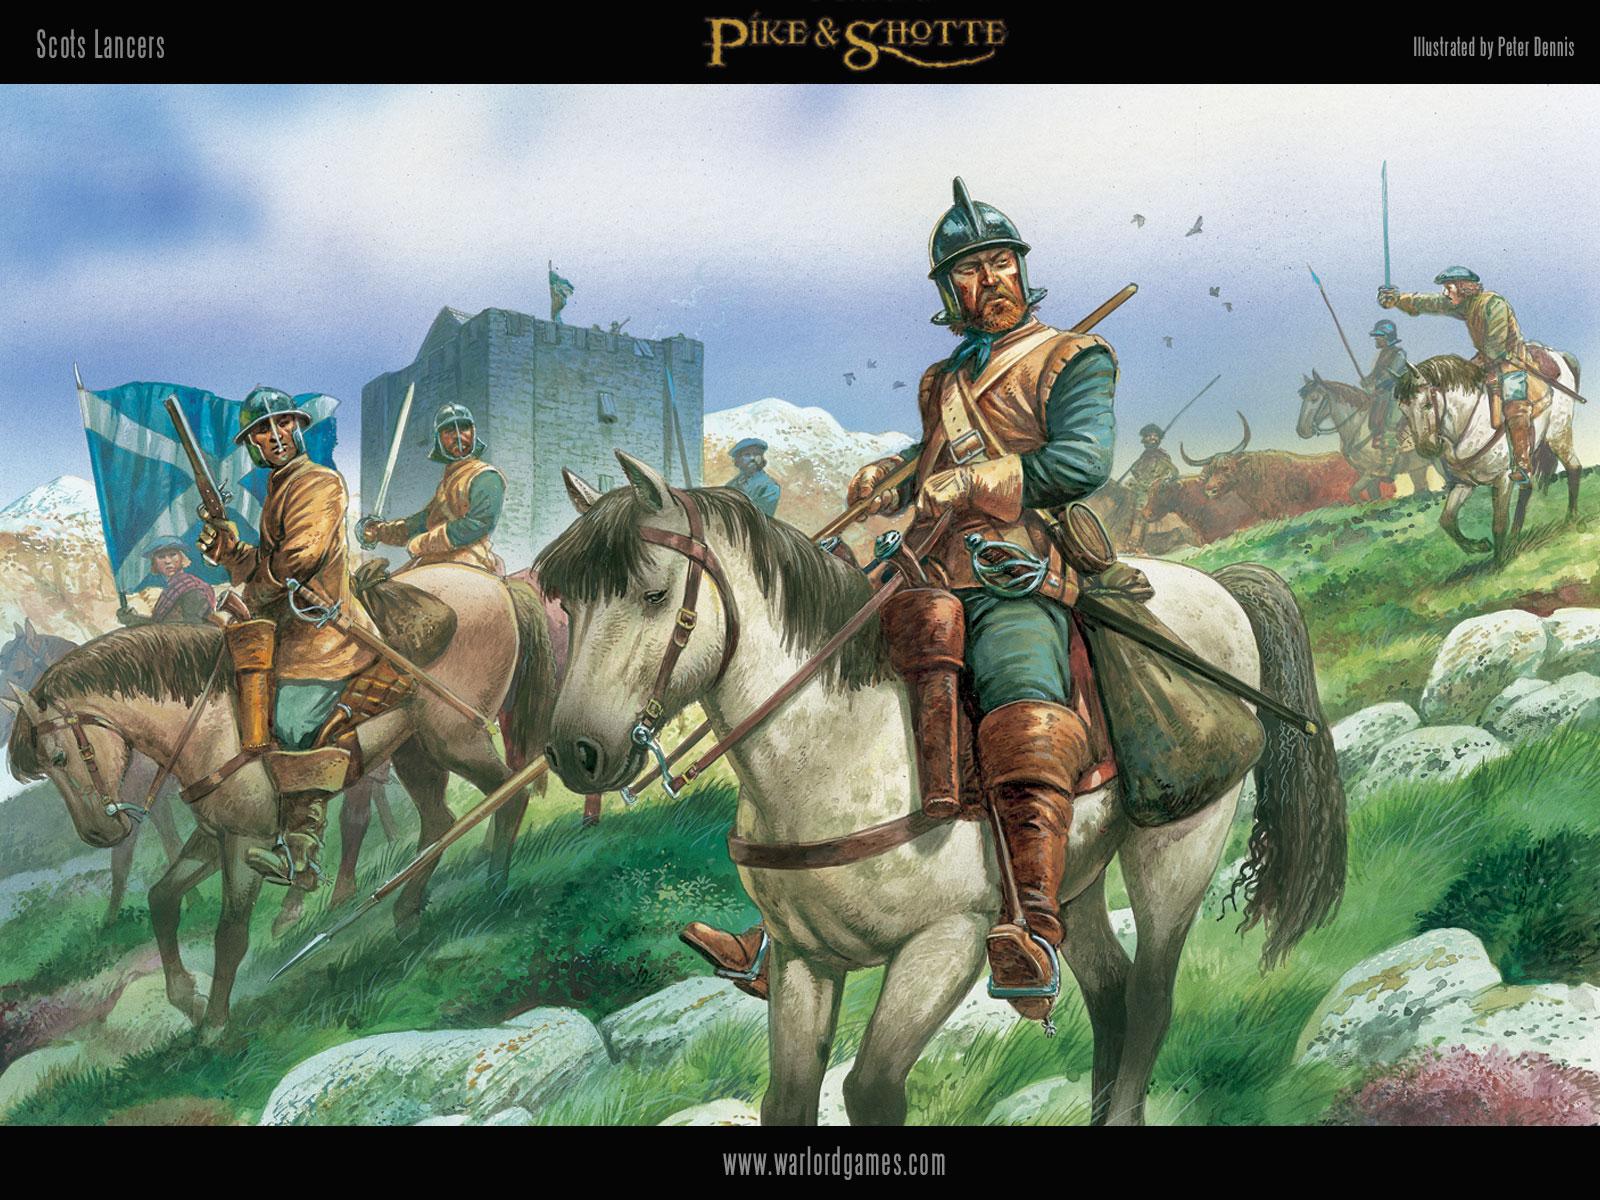 Illustrations P&S Scots-Lancers-wallpaper